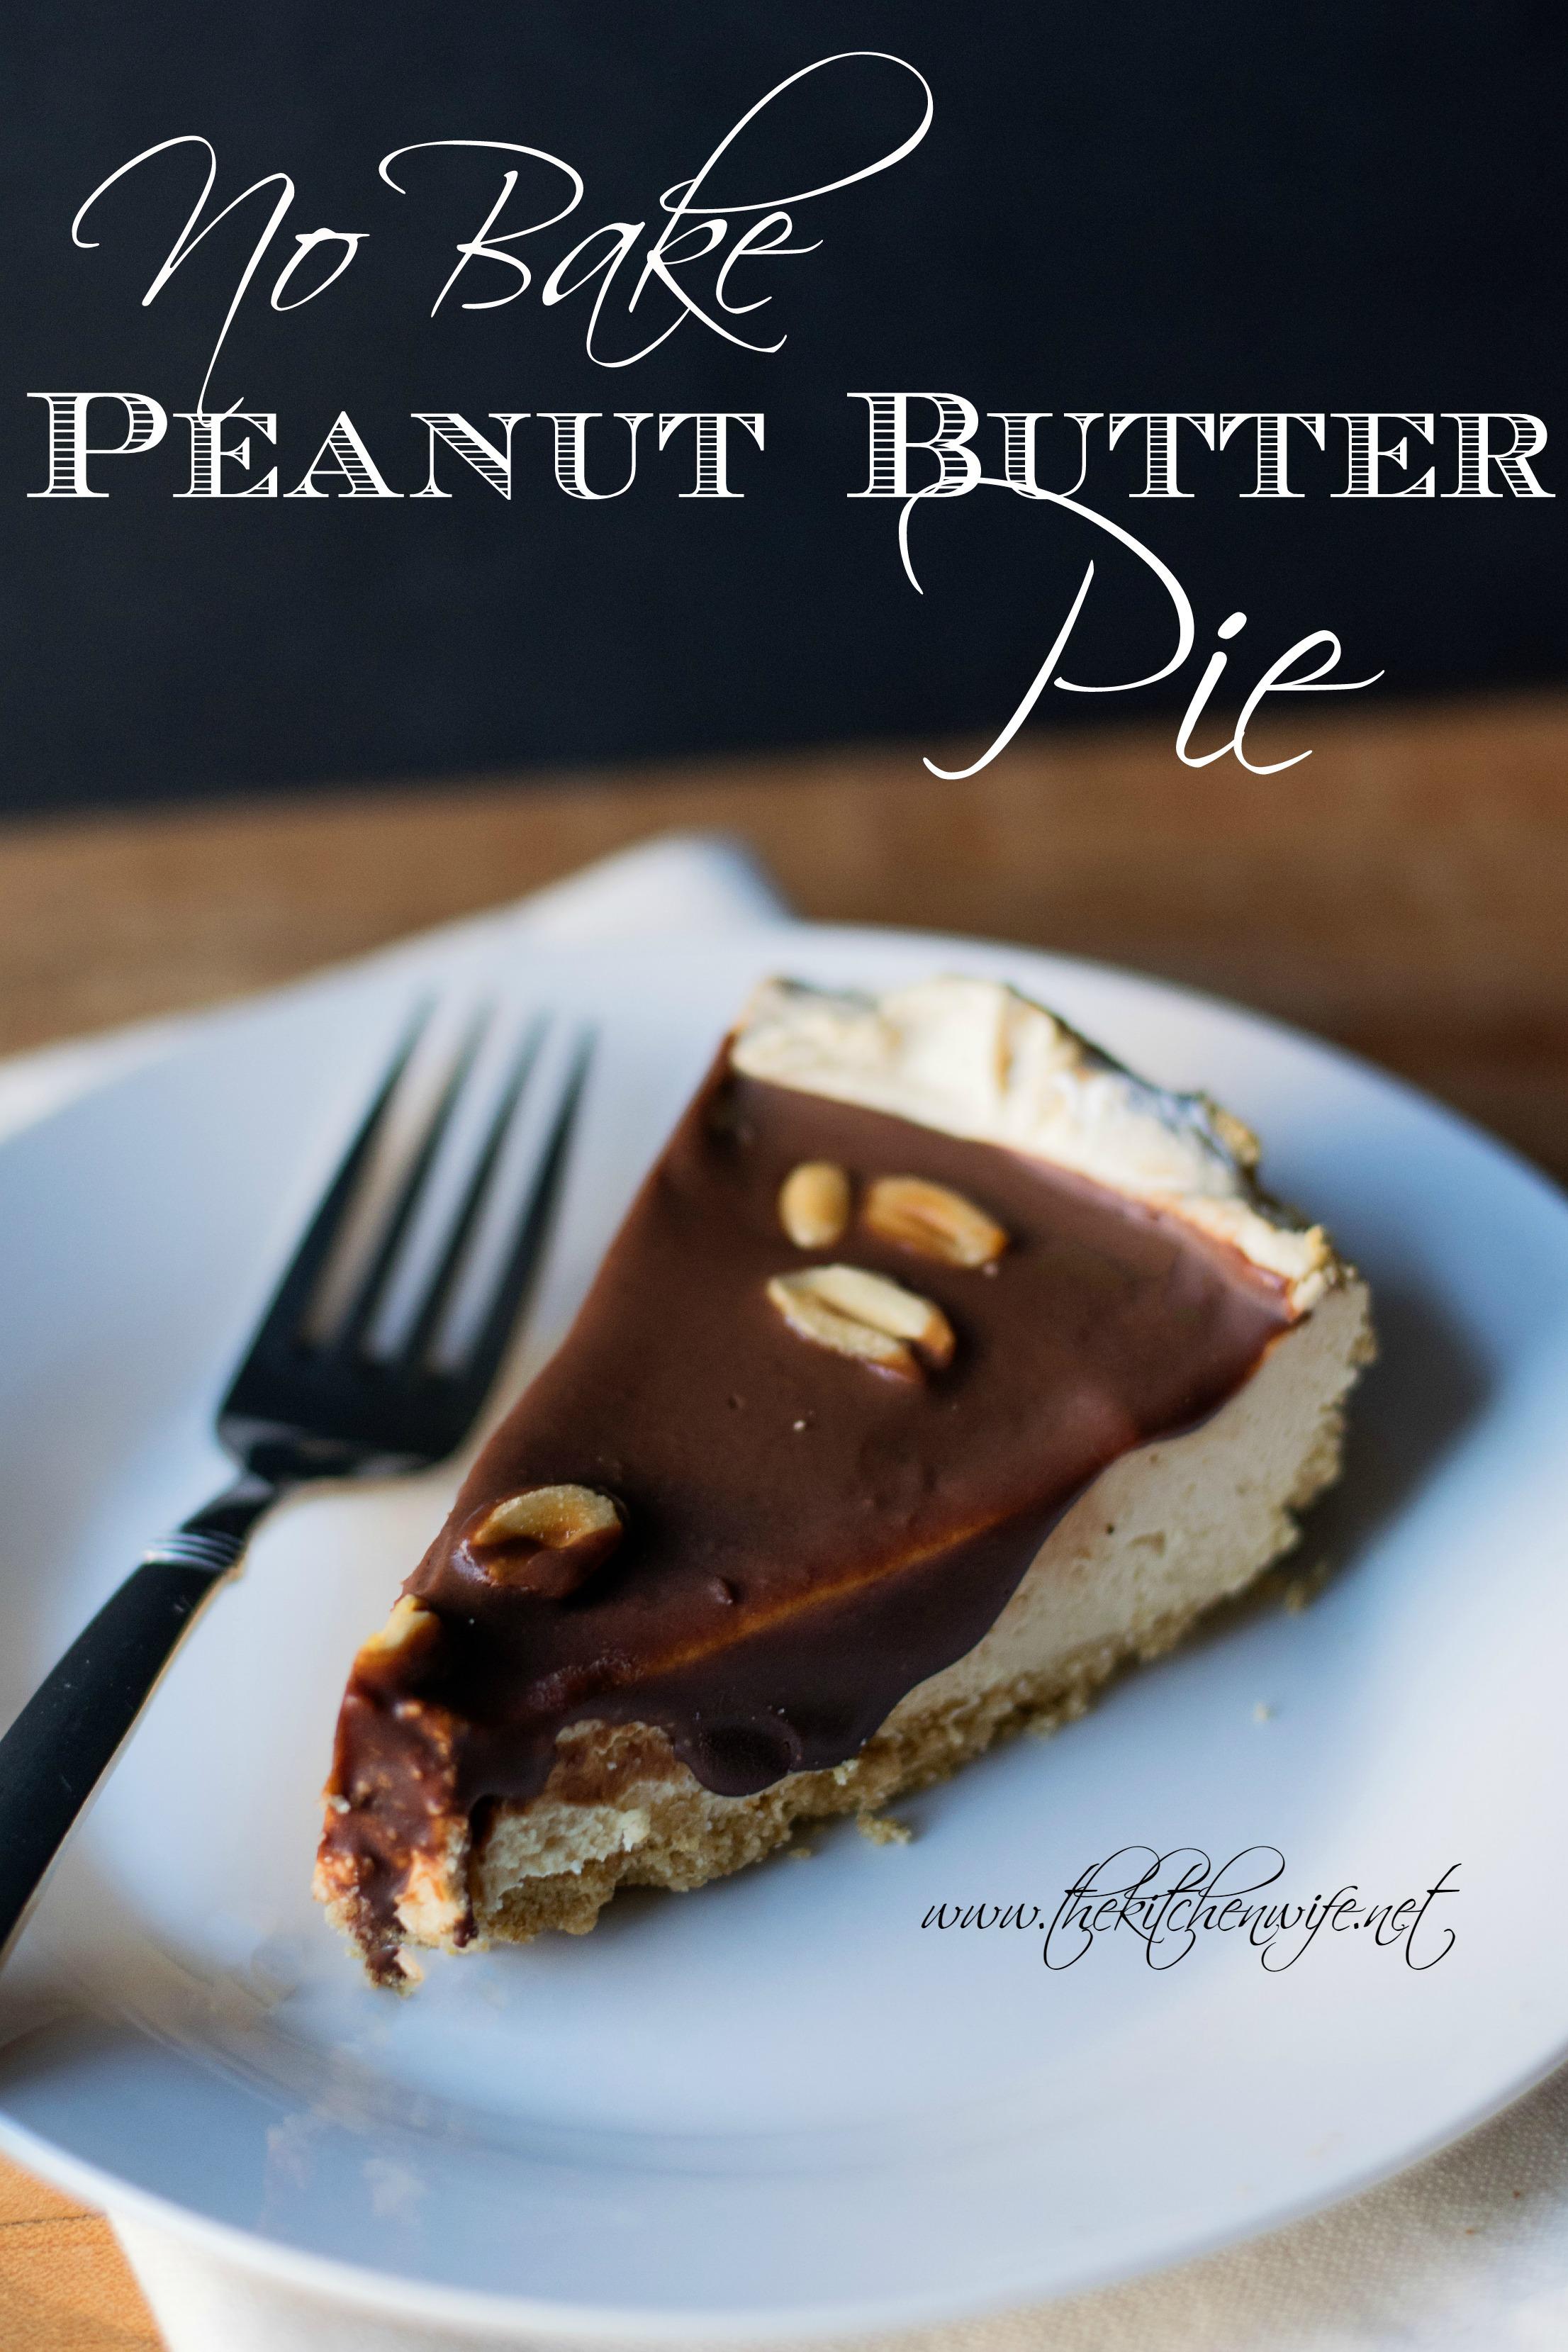 No Bake Peanut Butter Pie - Made From Pinterest